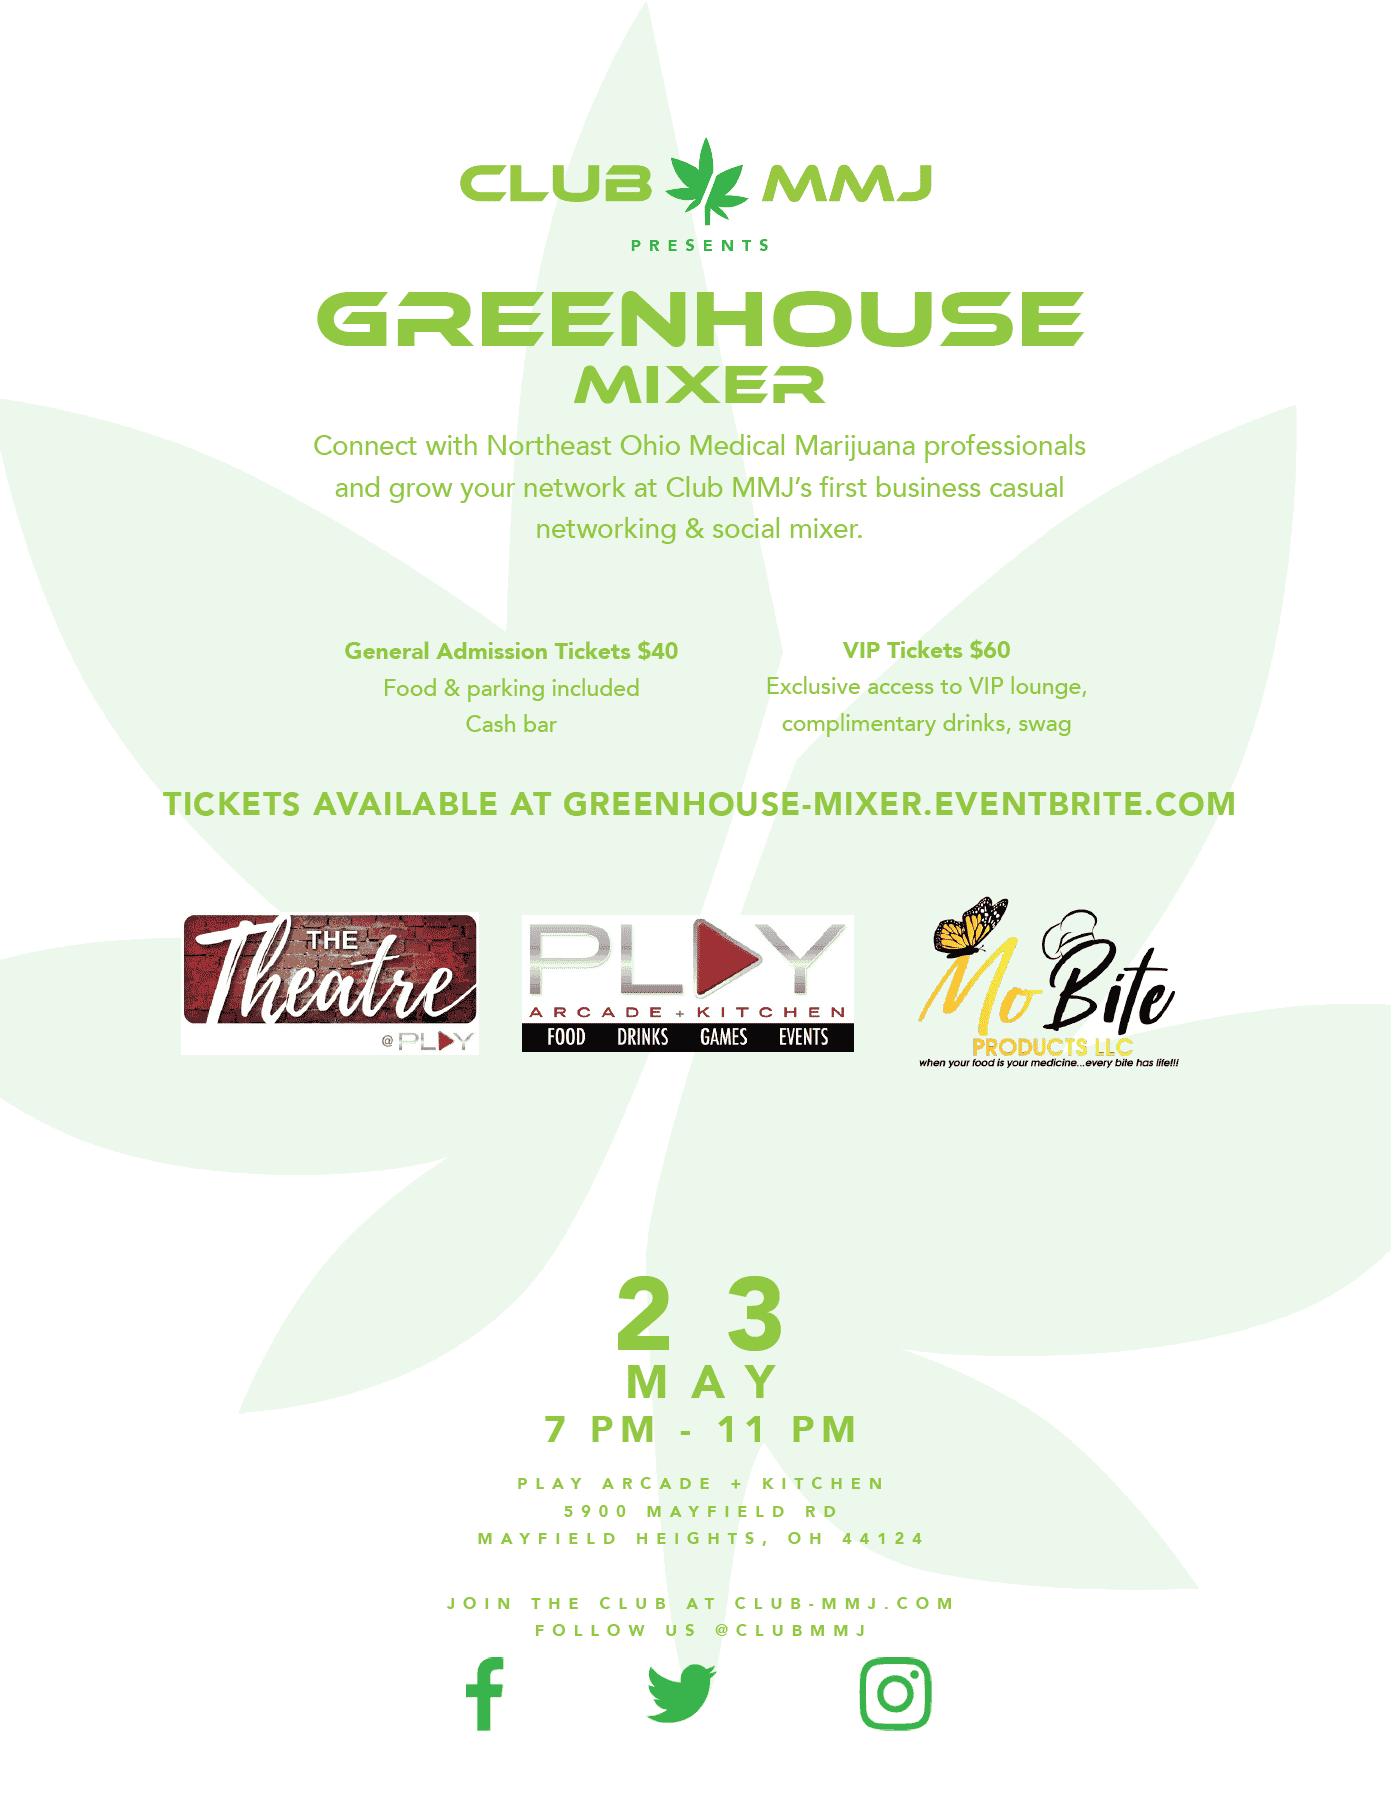 ClubMMJ Greenhouse Mixer - Cleveland